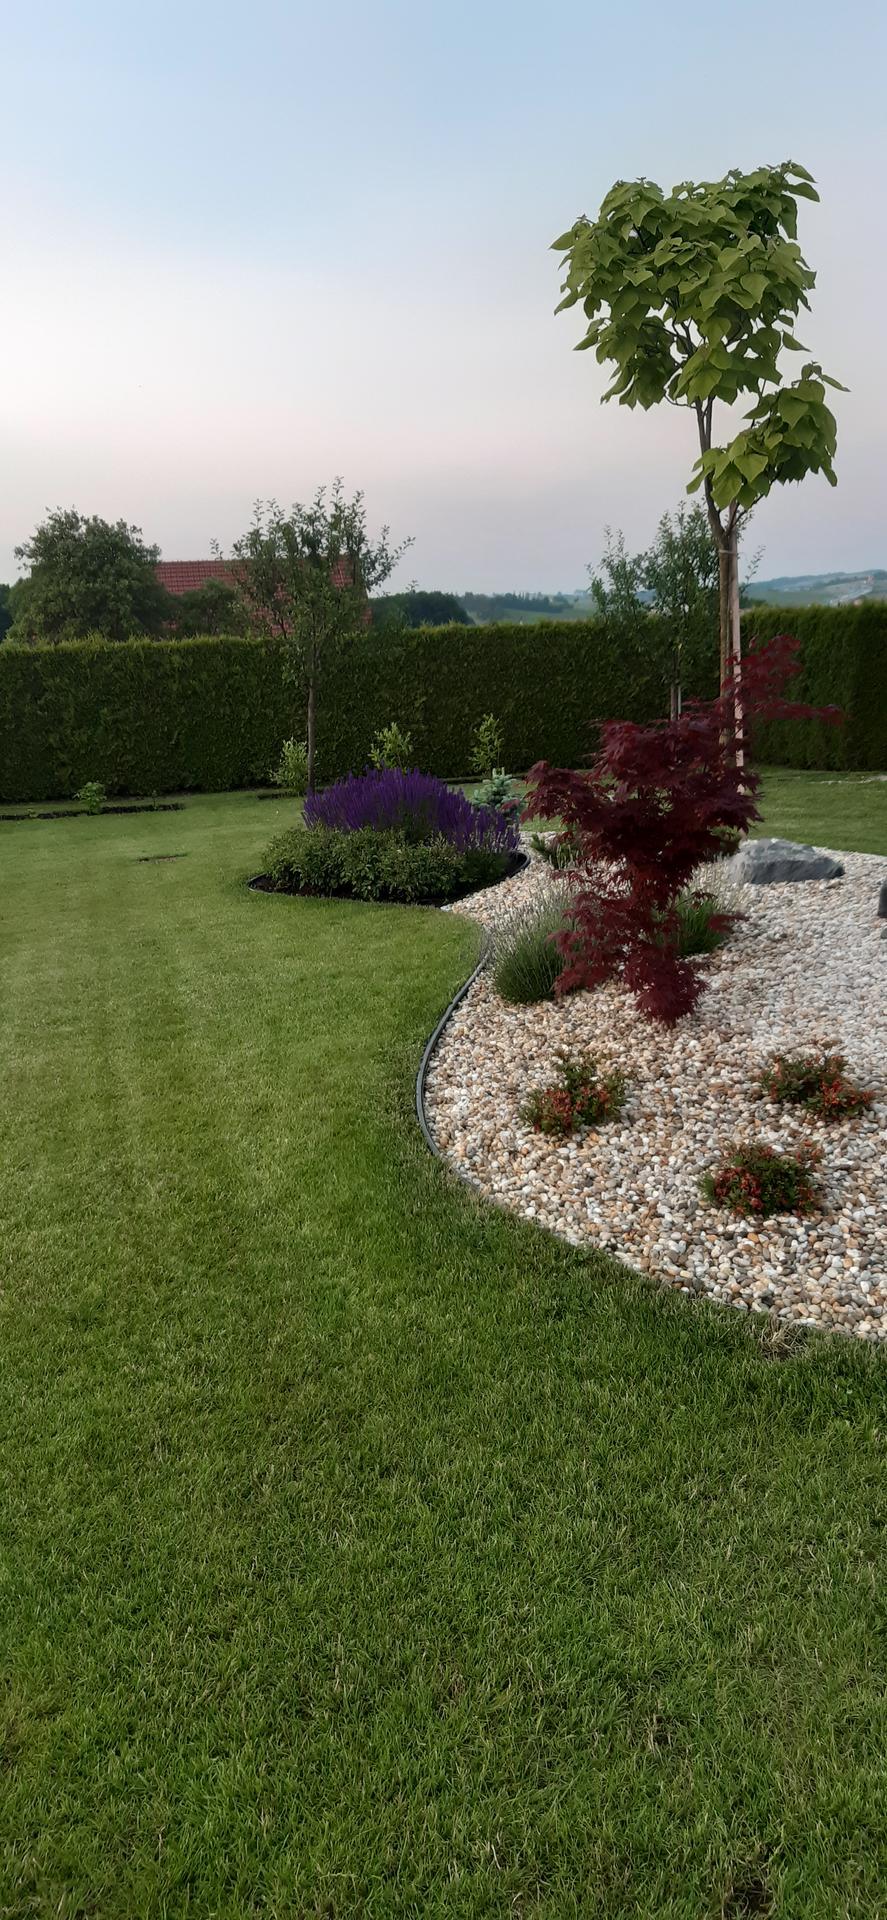 Zahrada 2021 - Obrázek č. 29